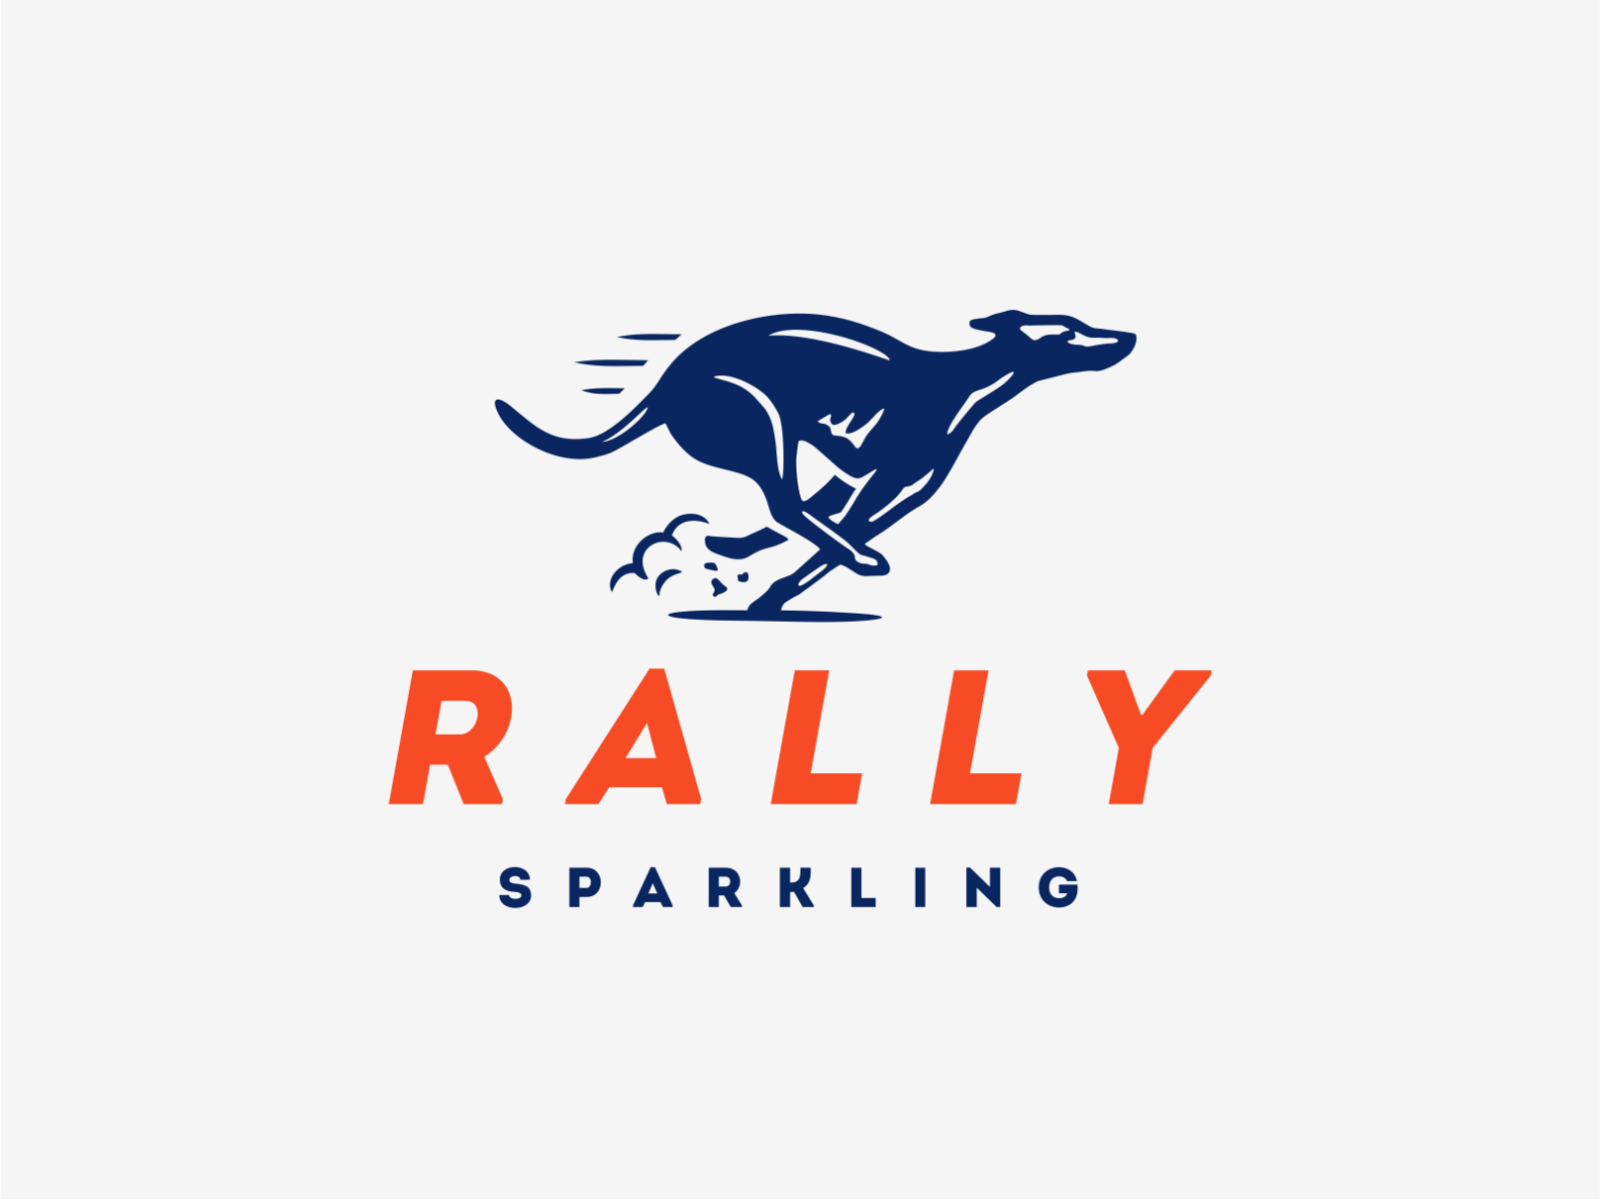 Rally Sparkling